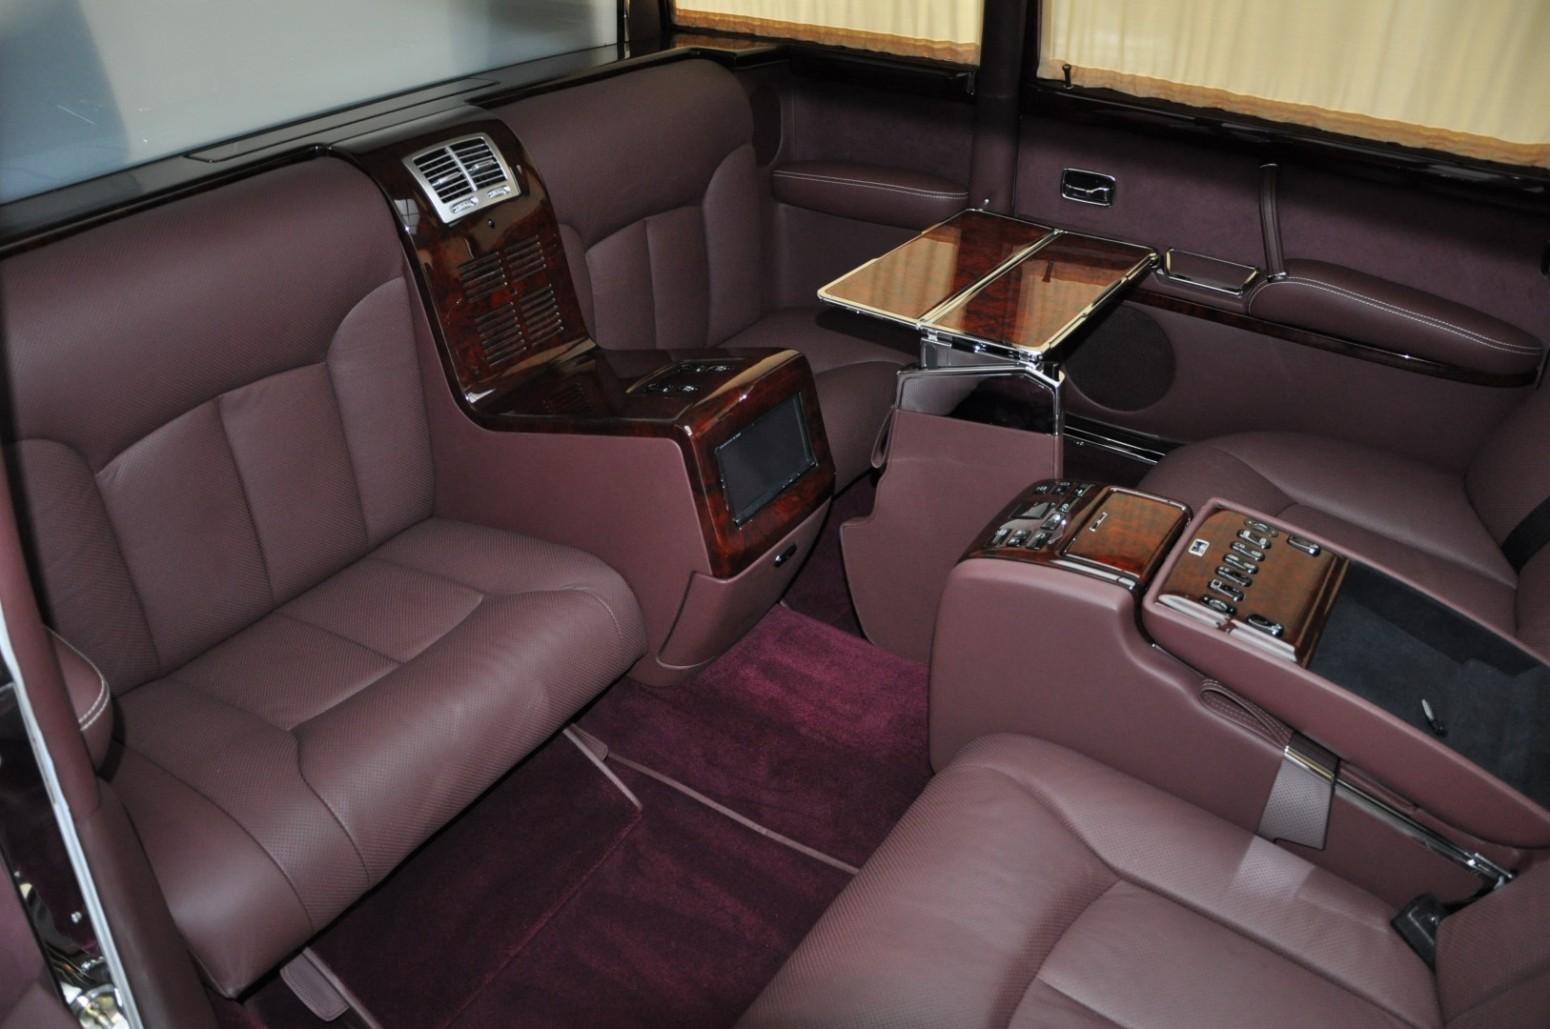 Mercedes-Benz 600 Pullman seats